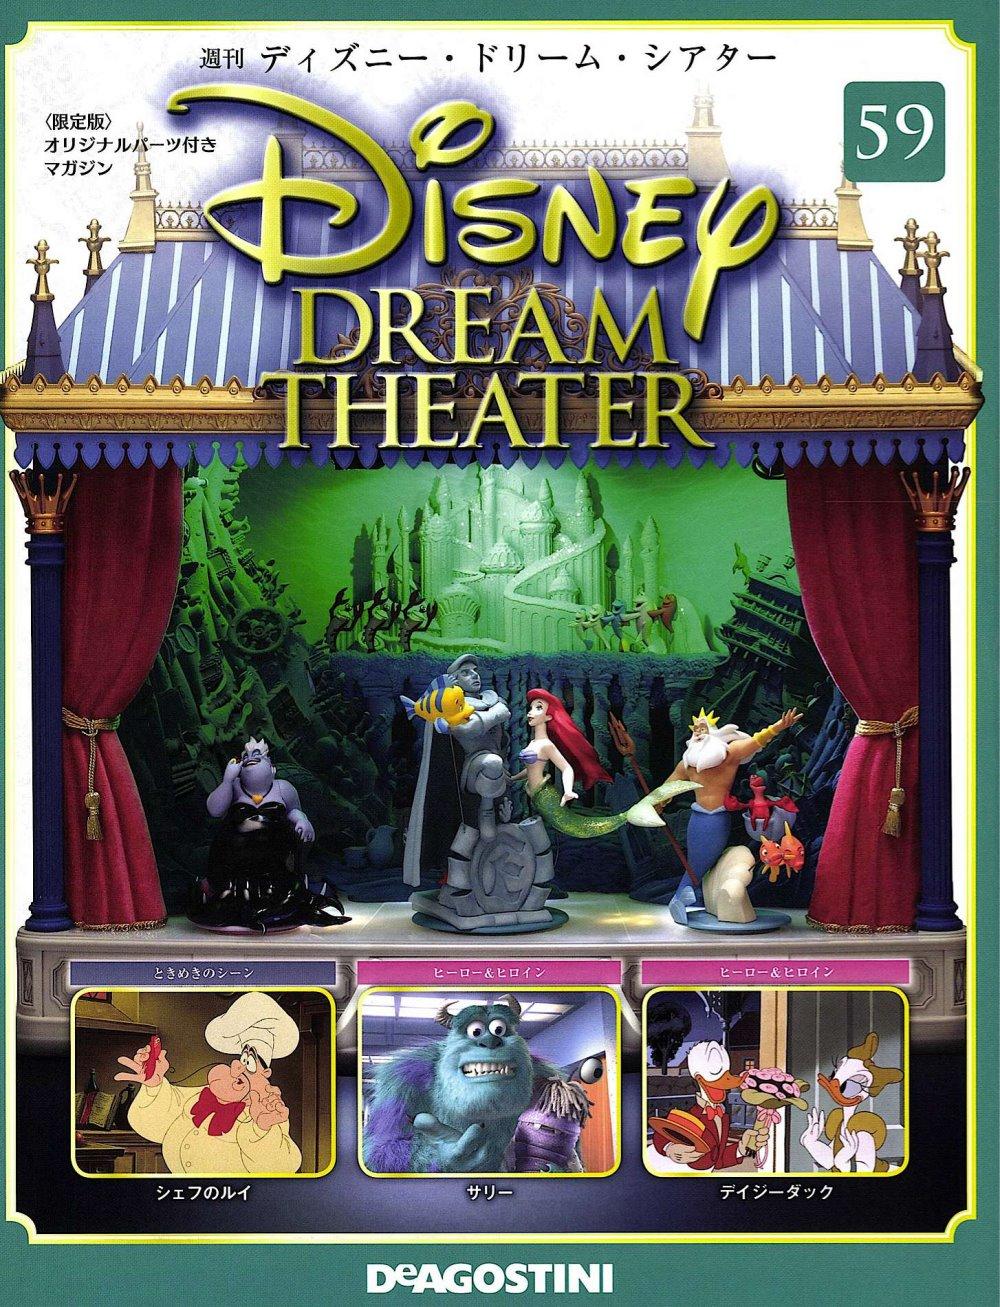 Disney Dream Theater 迪士尼夢幻劇場  日文版  2017 12 12